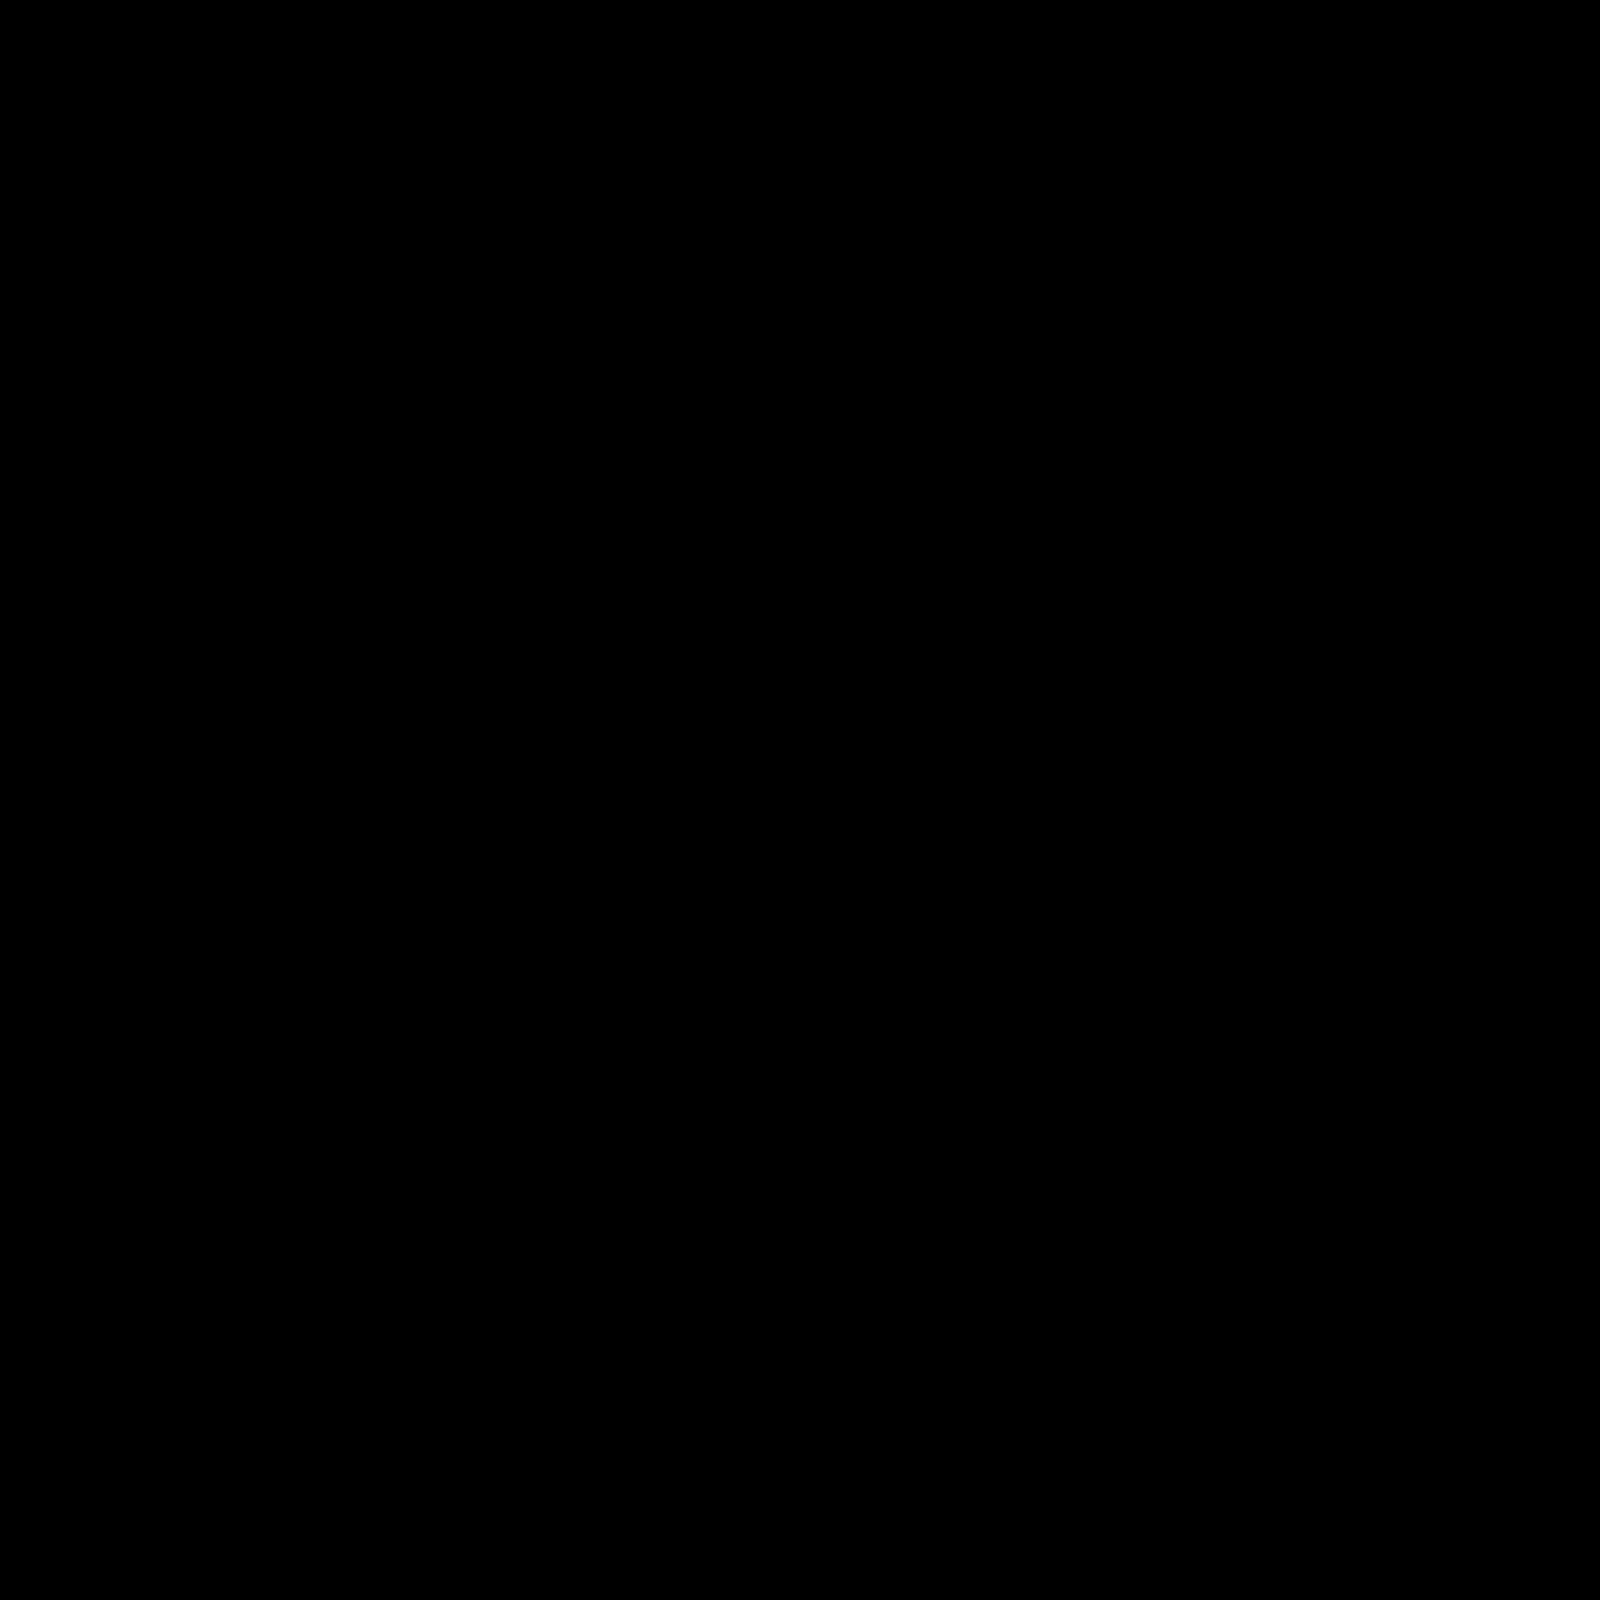 Computer icons clip art. Kiss clipart icon